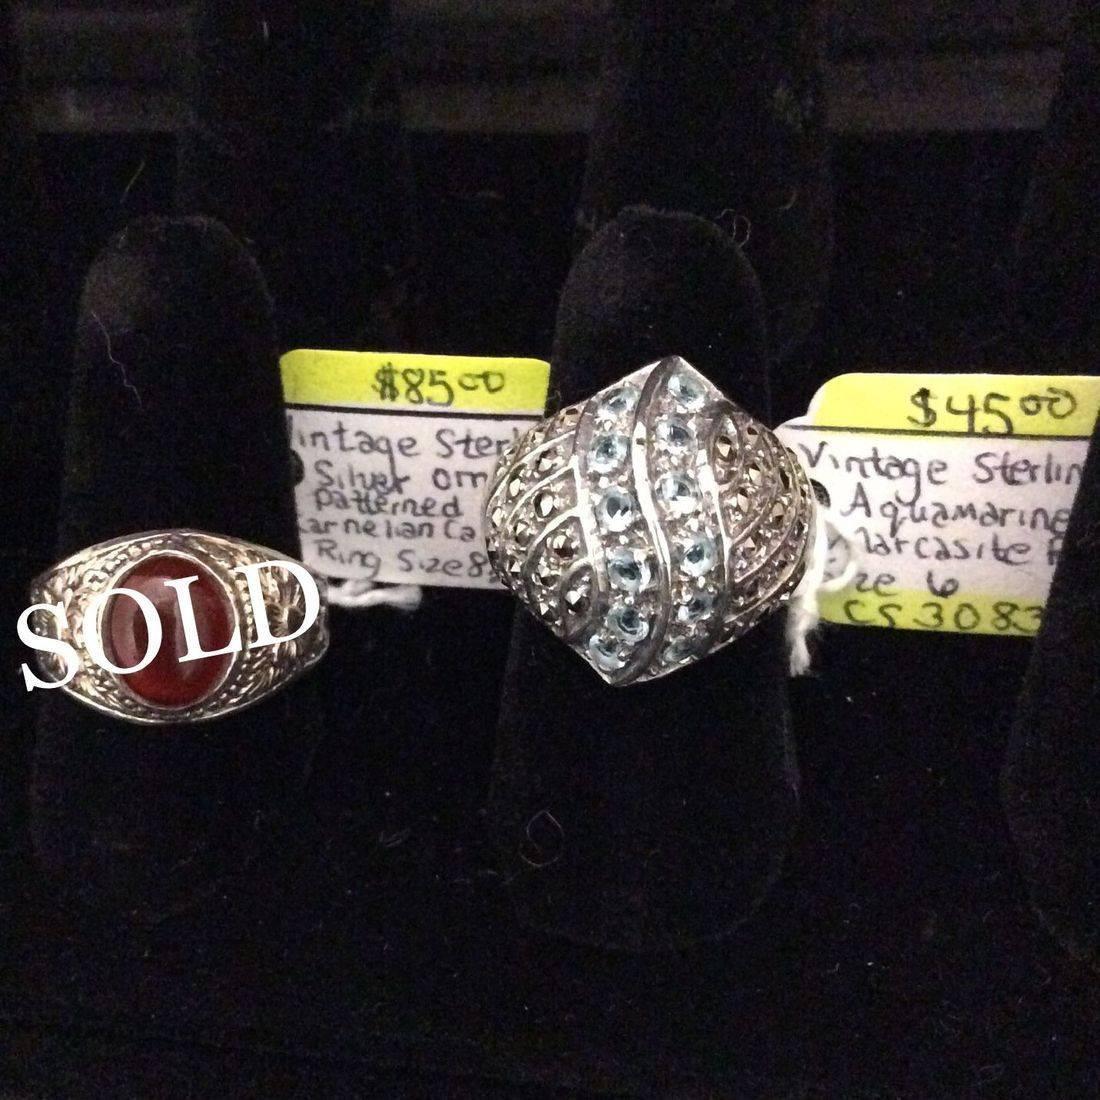 Vin. Sterling, Ornate Patterned, Carnelian Cabochon Ring  $85,  Vin. Sterling, Aquamarine, Marcasite Ring  $45.00